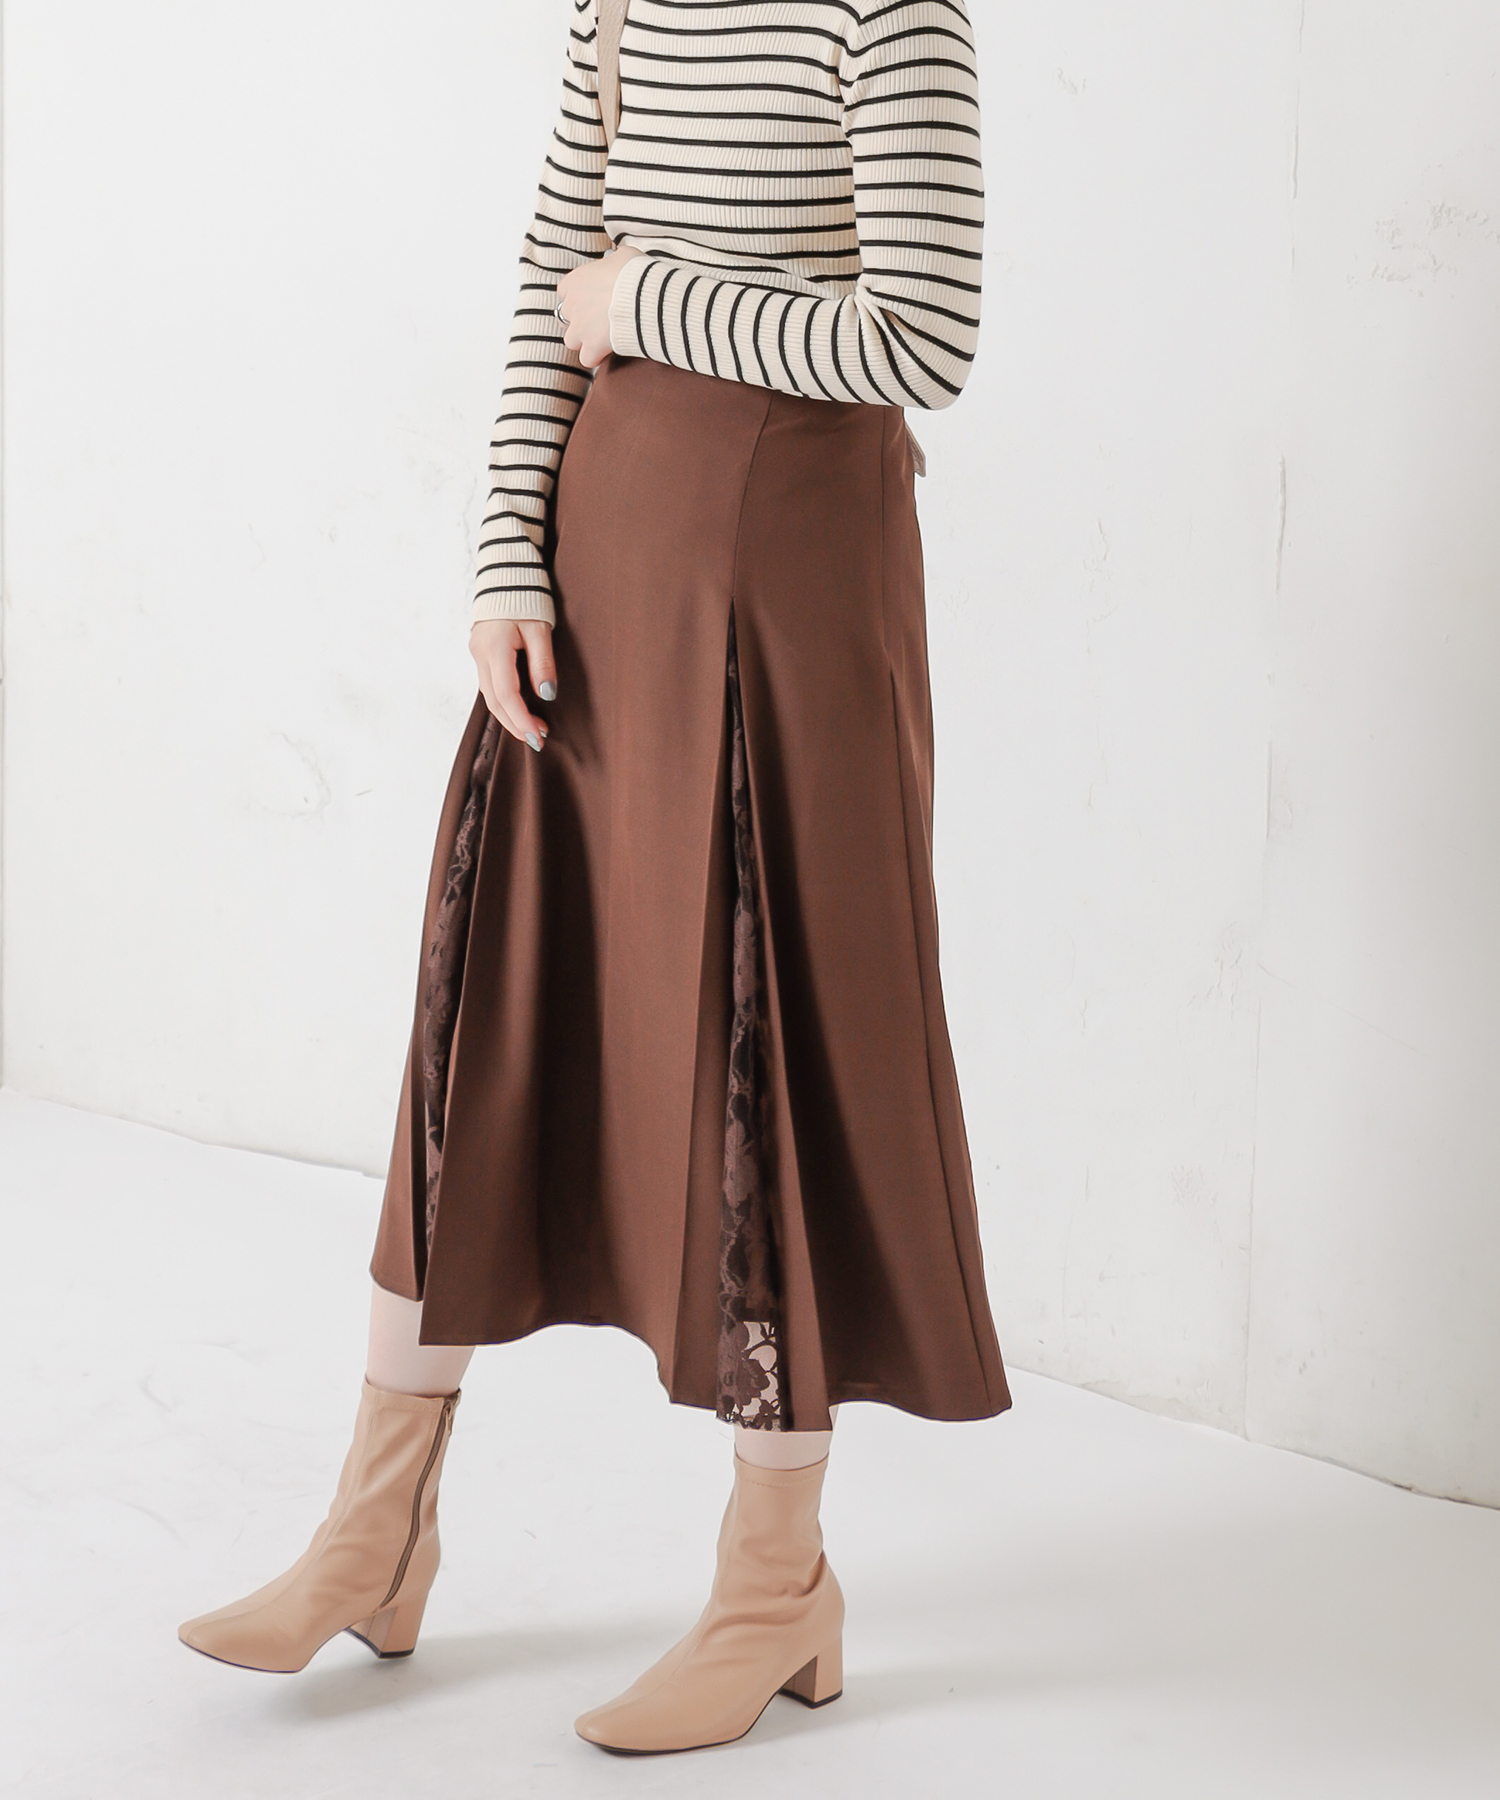 natural couture(ナチュラルクチュール) 8枚接ぎレースちら見えスカート